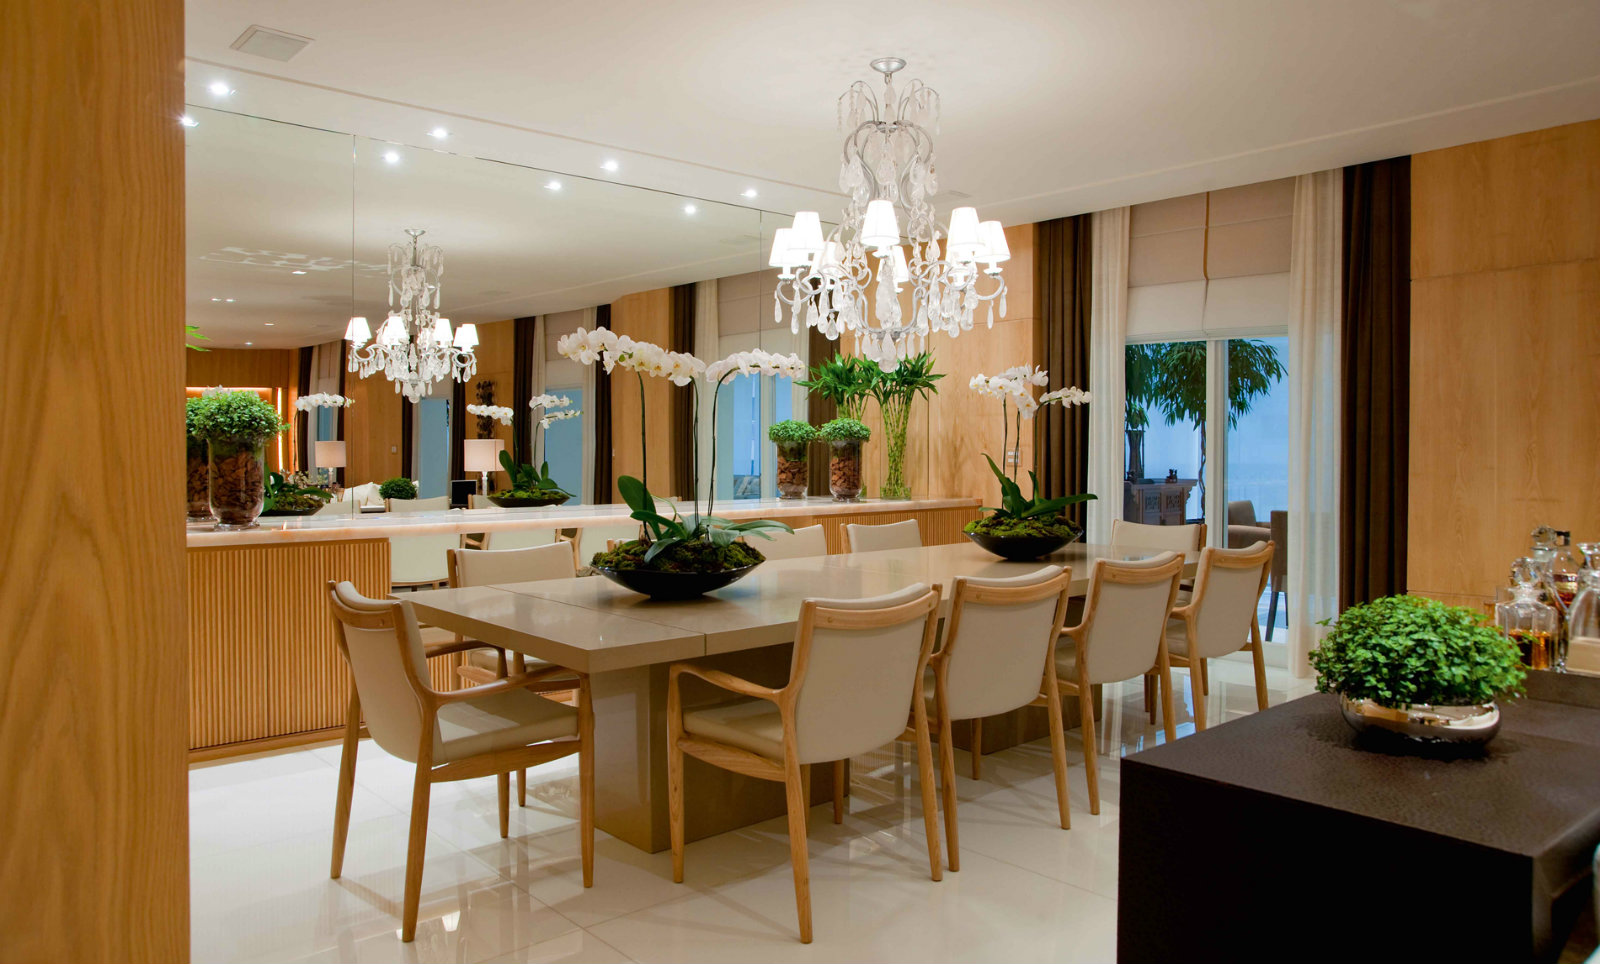 Sala De Jantar Koerich ~ Dicas para decorar a Sala de Jantar